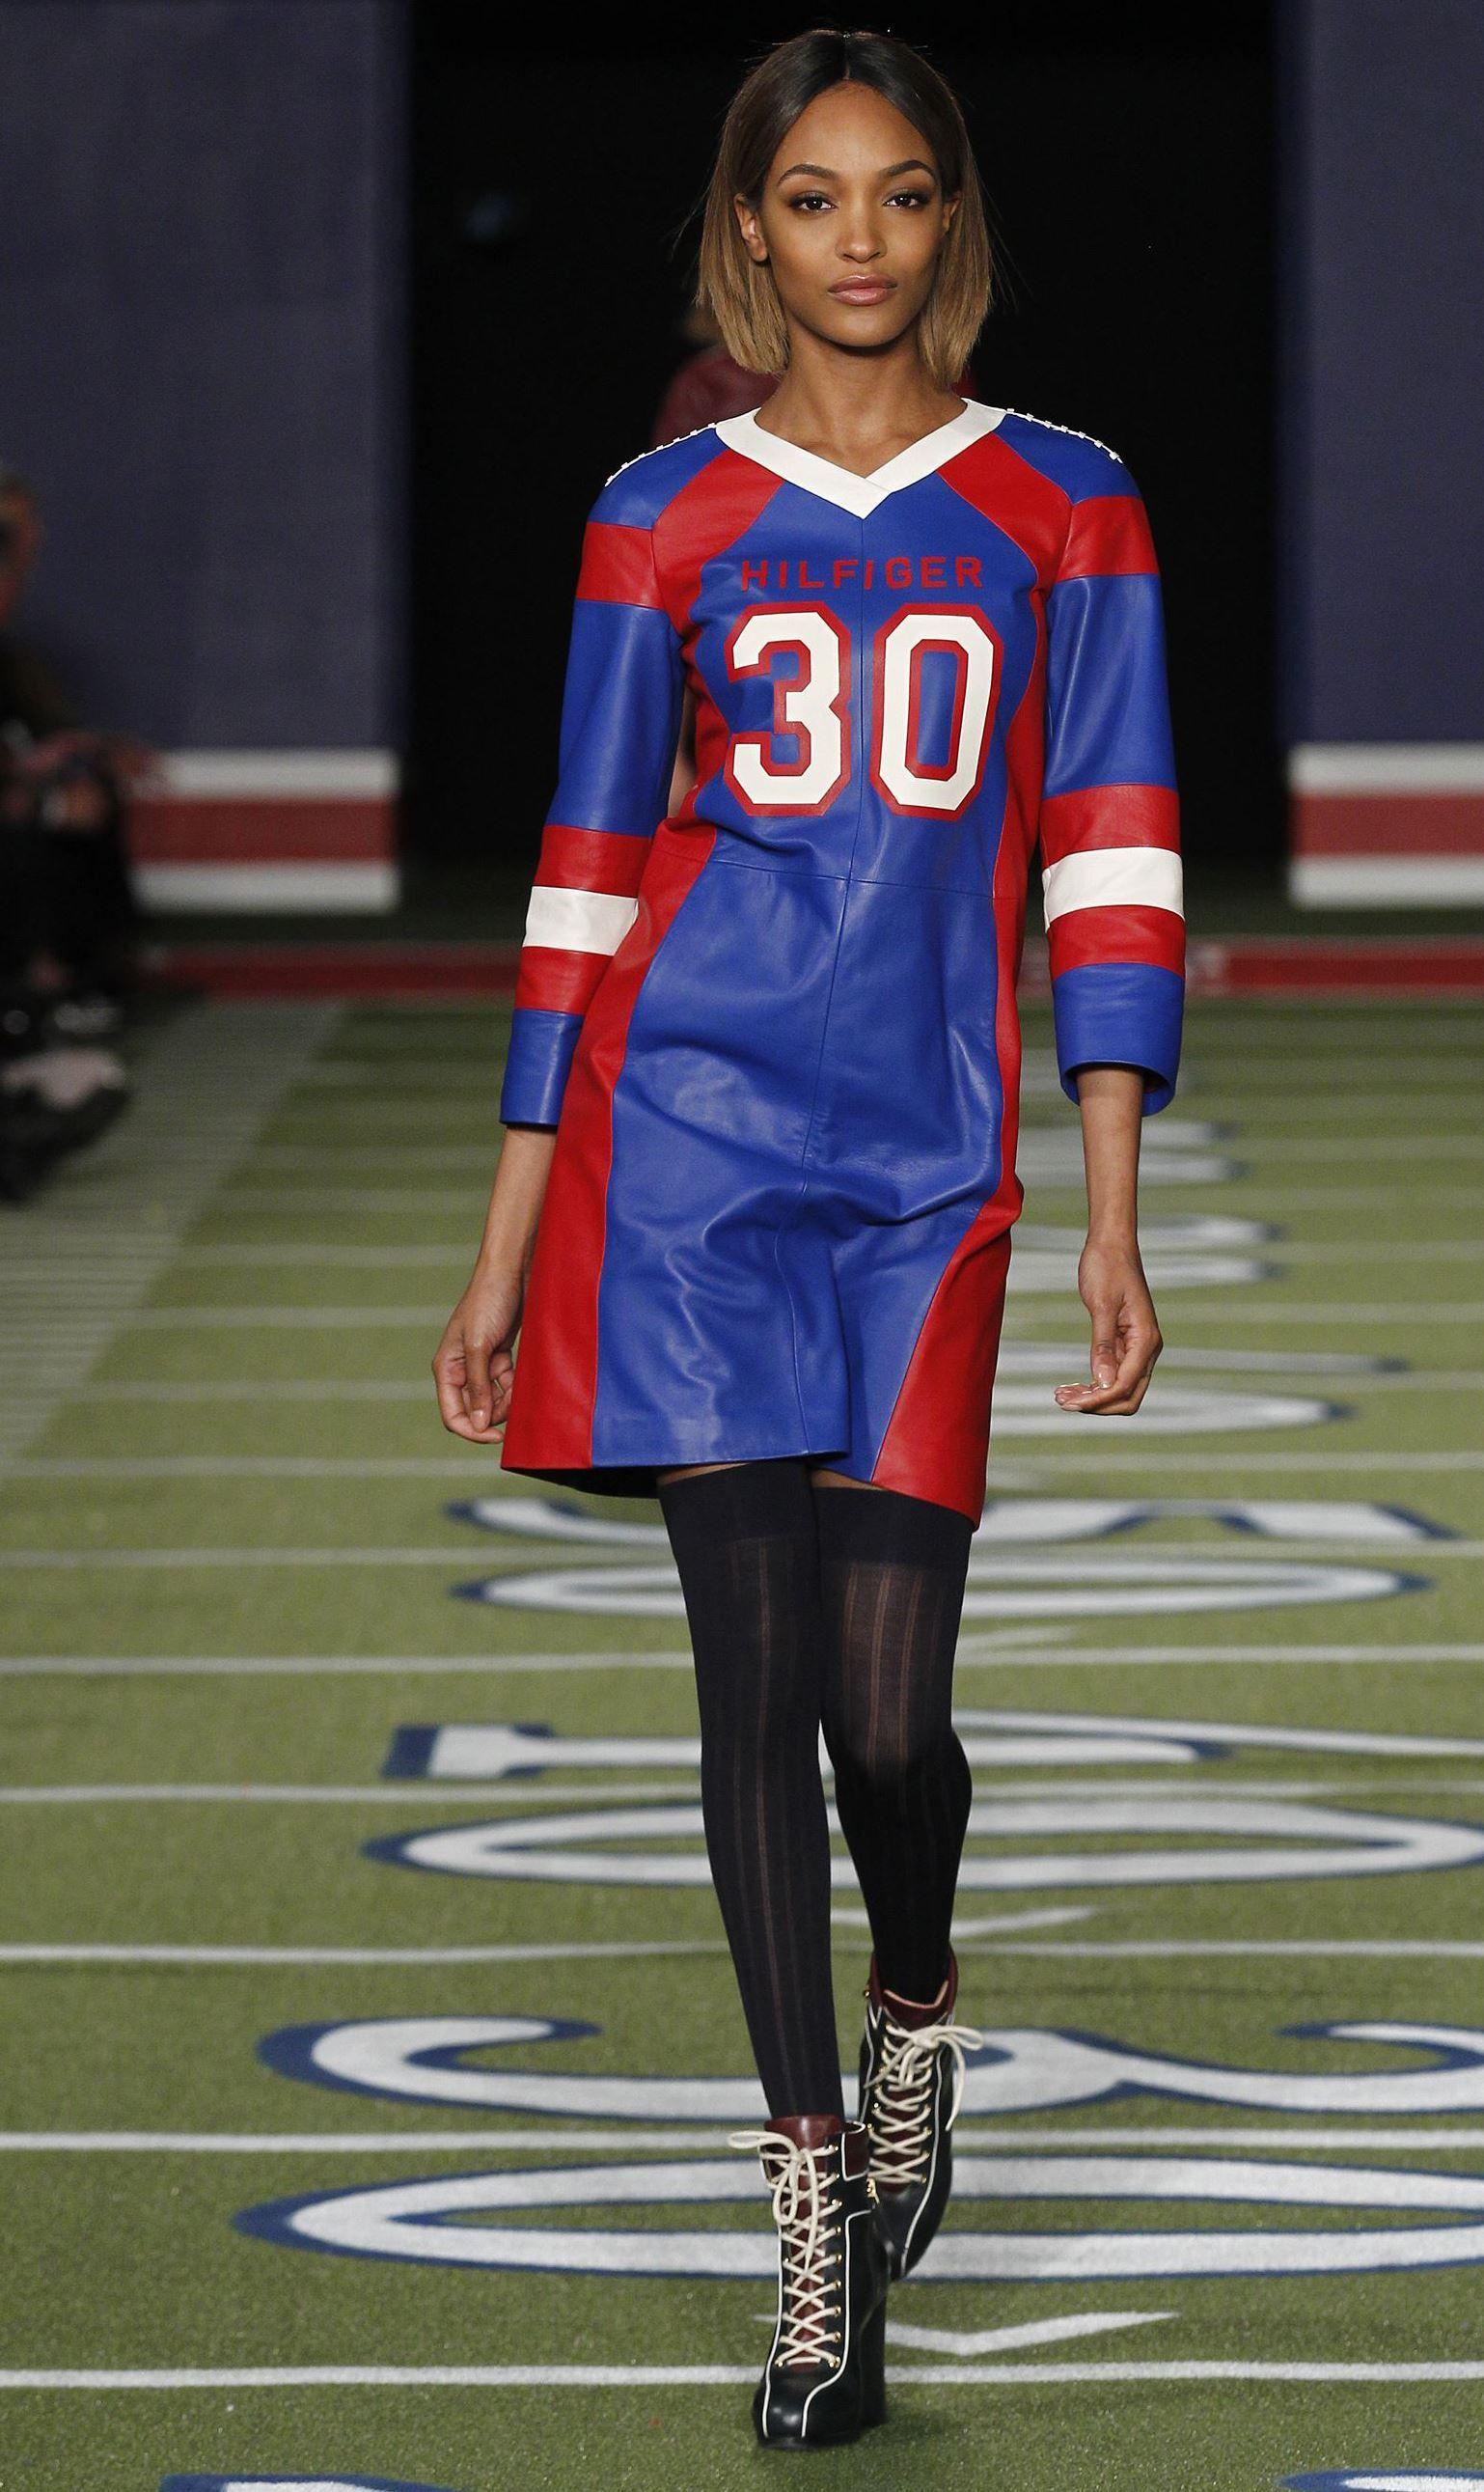 60c4270efb315 american football fashion show - Google Search